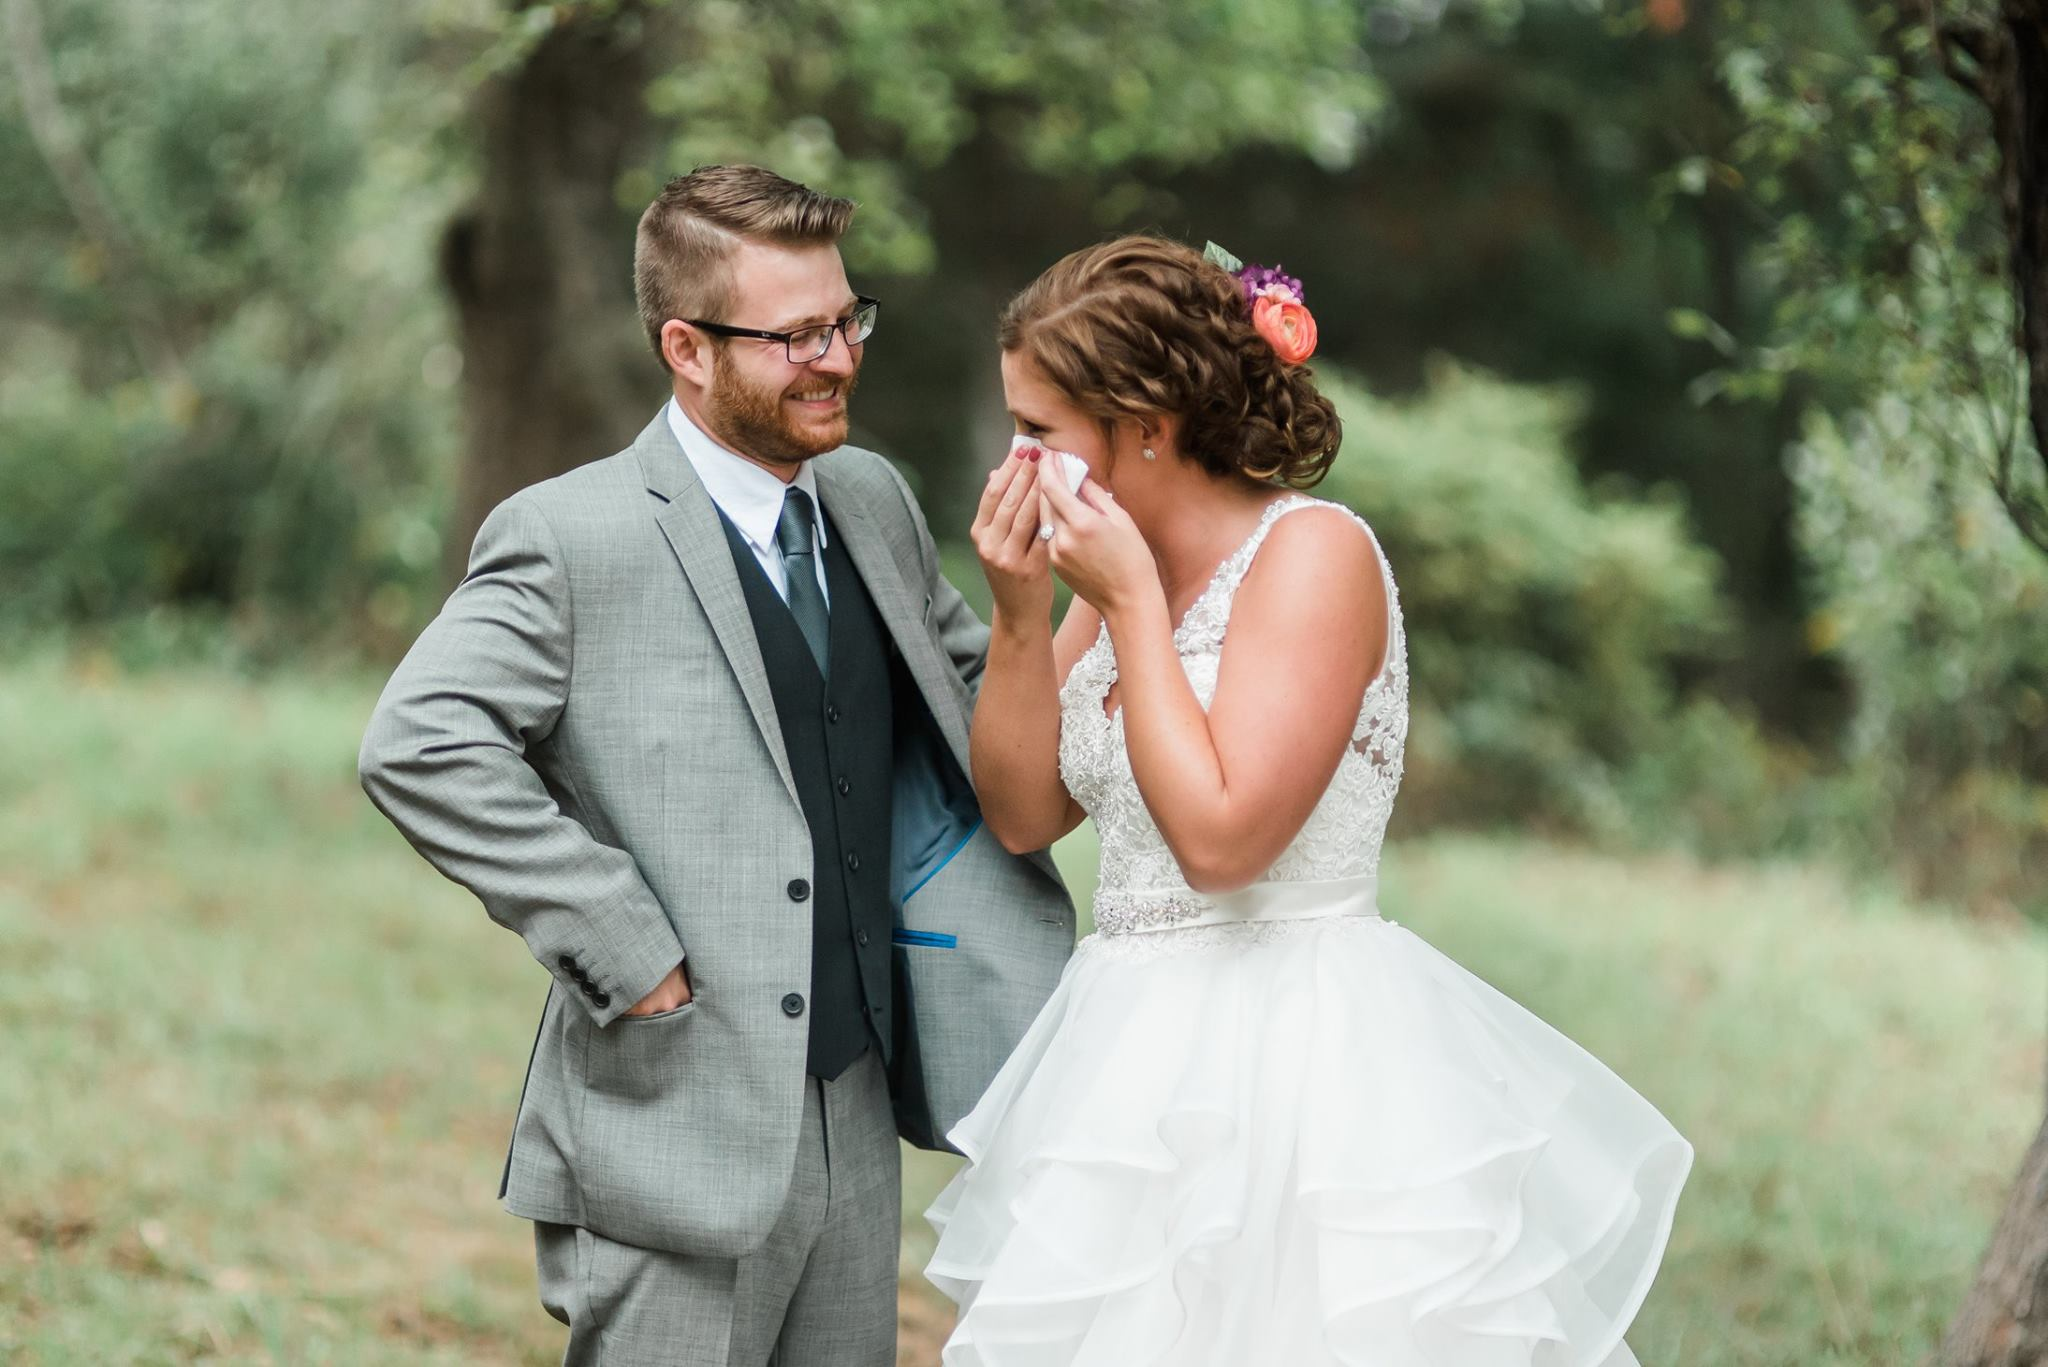 pennsylvania-backyard-wedding-love-diy-bohemian-romantic-colorful-0013.jpg